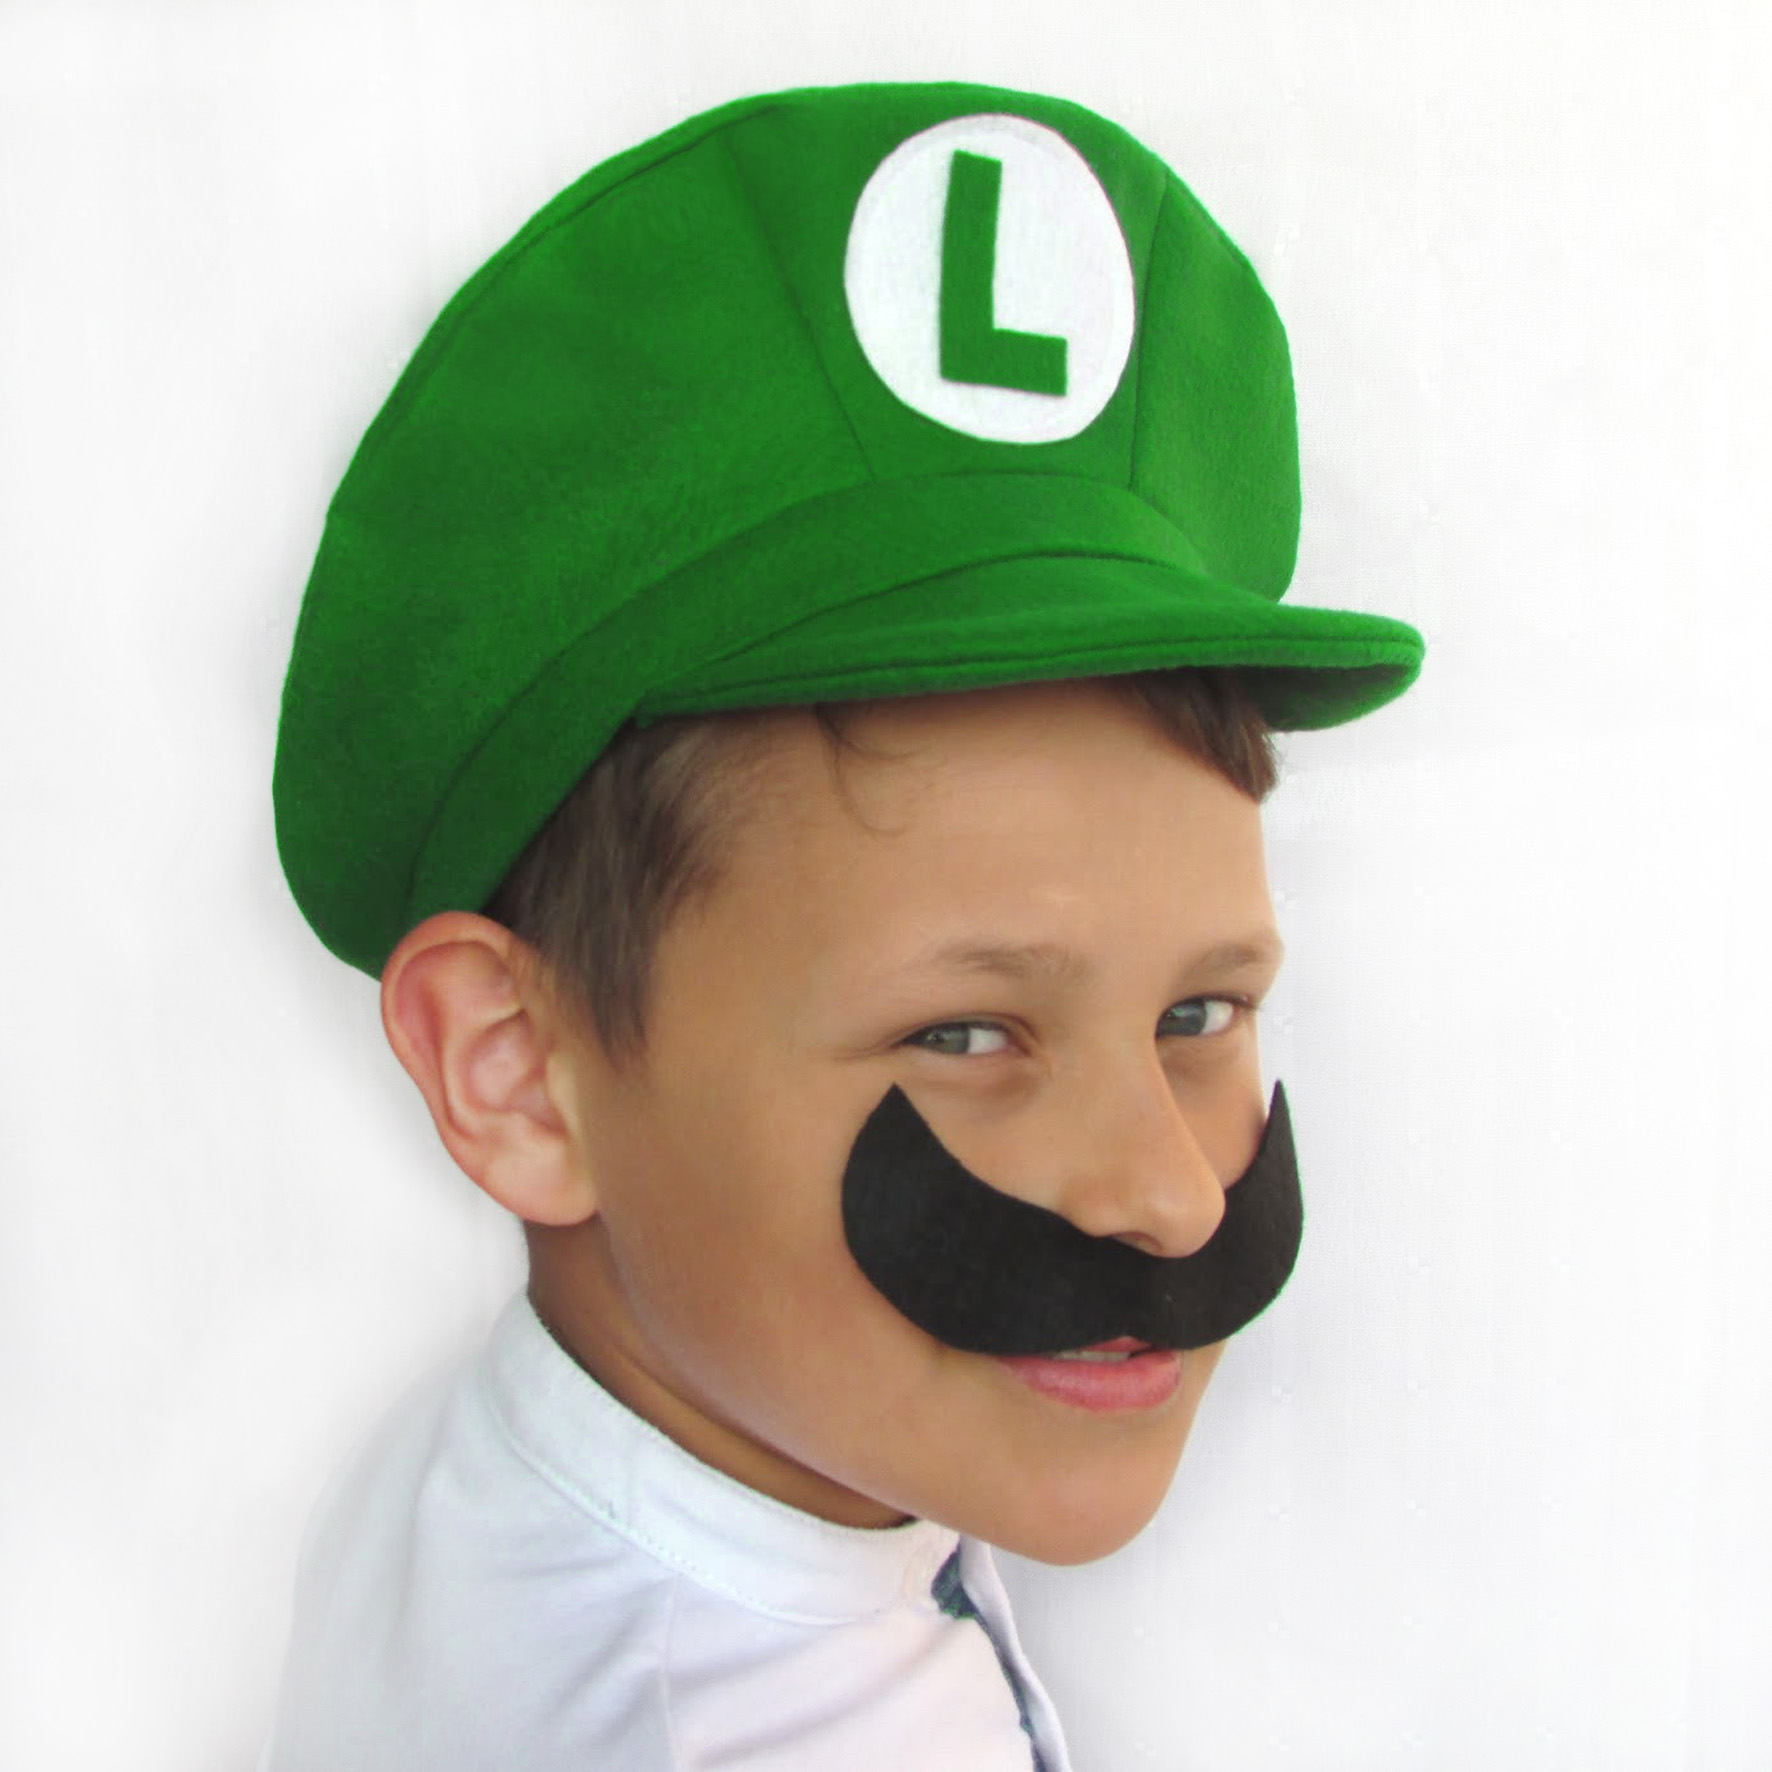 d20f1dc48d0e2 Boina em Croche Super Mario Bros